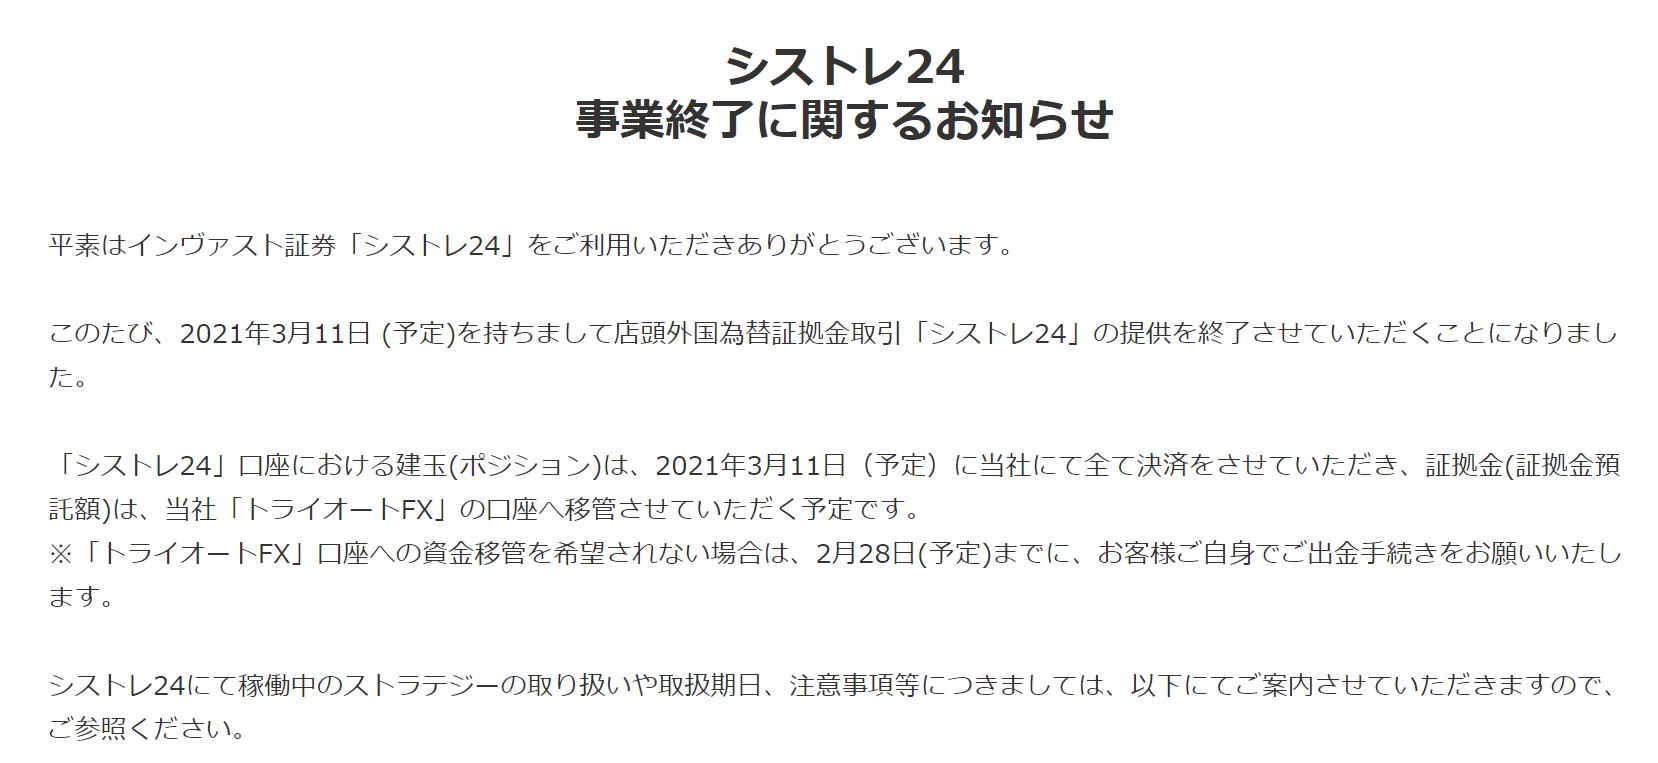 f:id:hodo-work:20210130141601p:plain